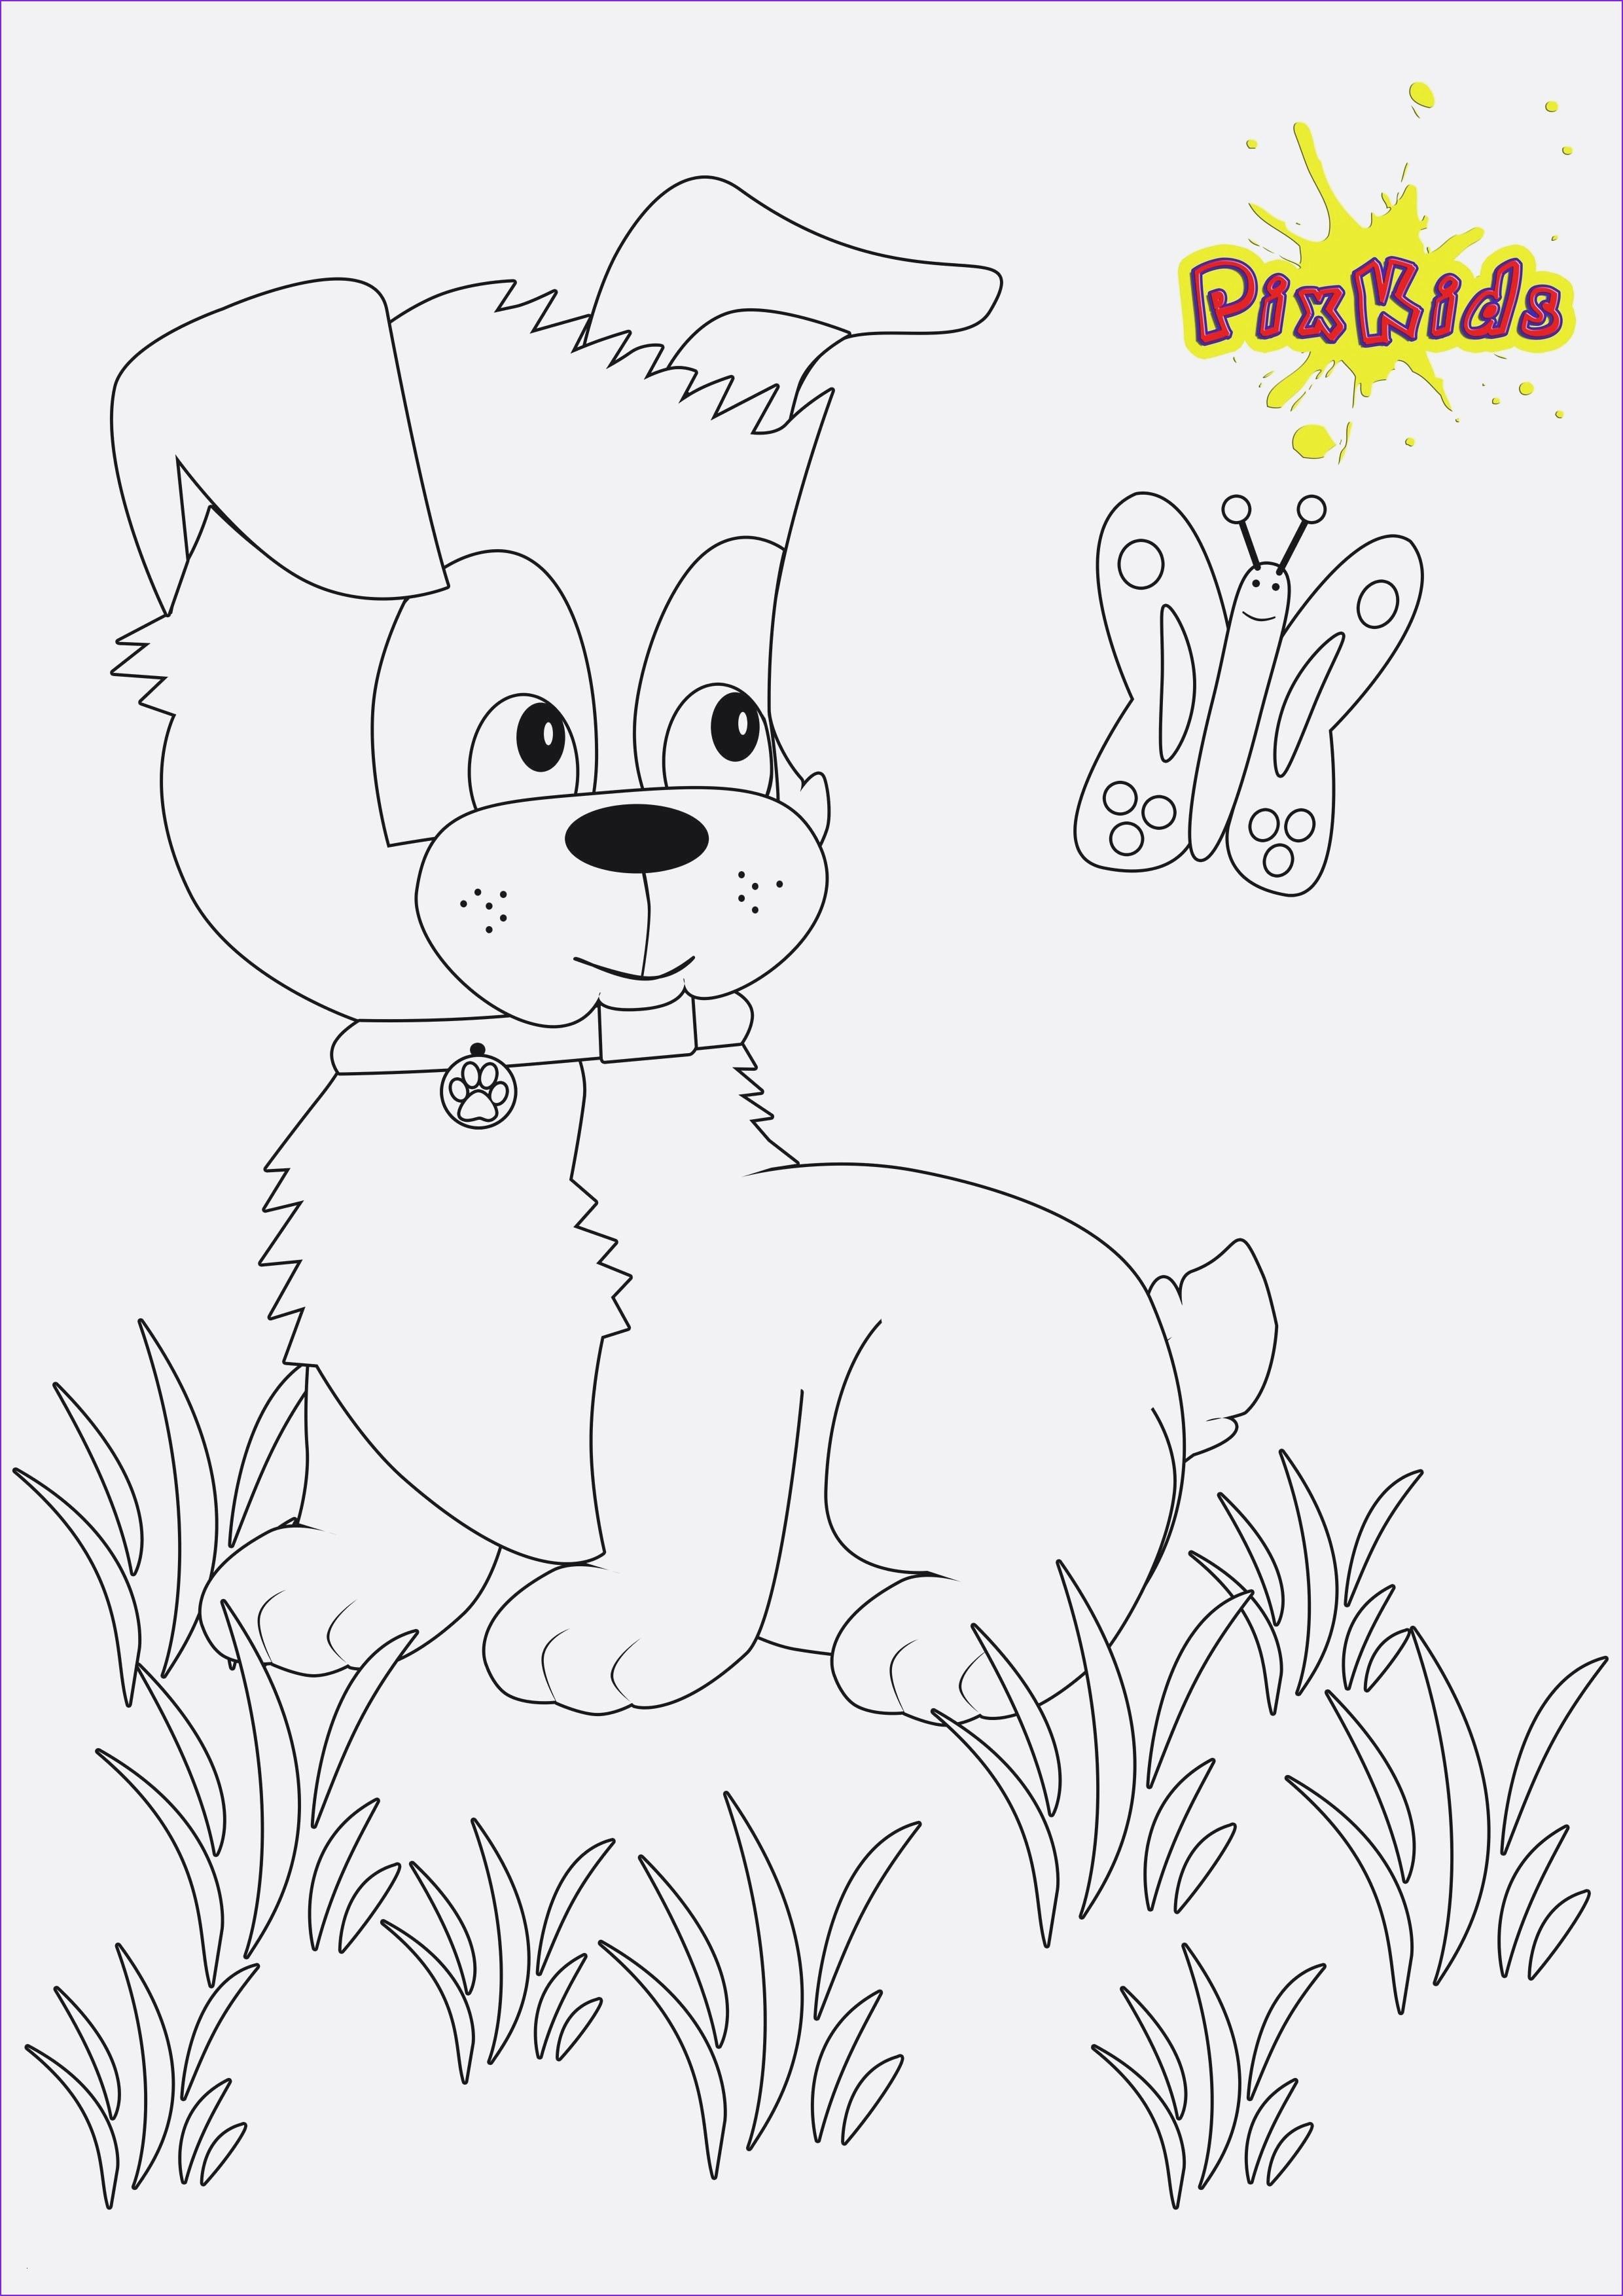 Mops Zum Ausmalen Einzigartig 35 Mops Ausmalbilder Scoredatscore Neu Hund Ausmalbilder Best Bild